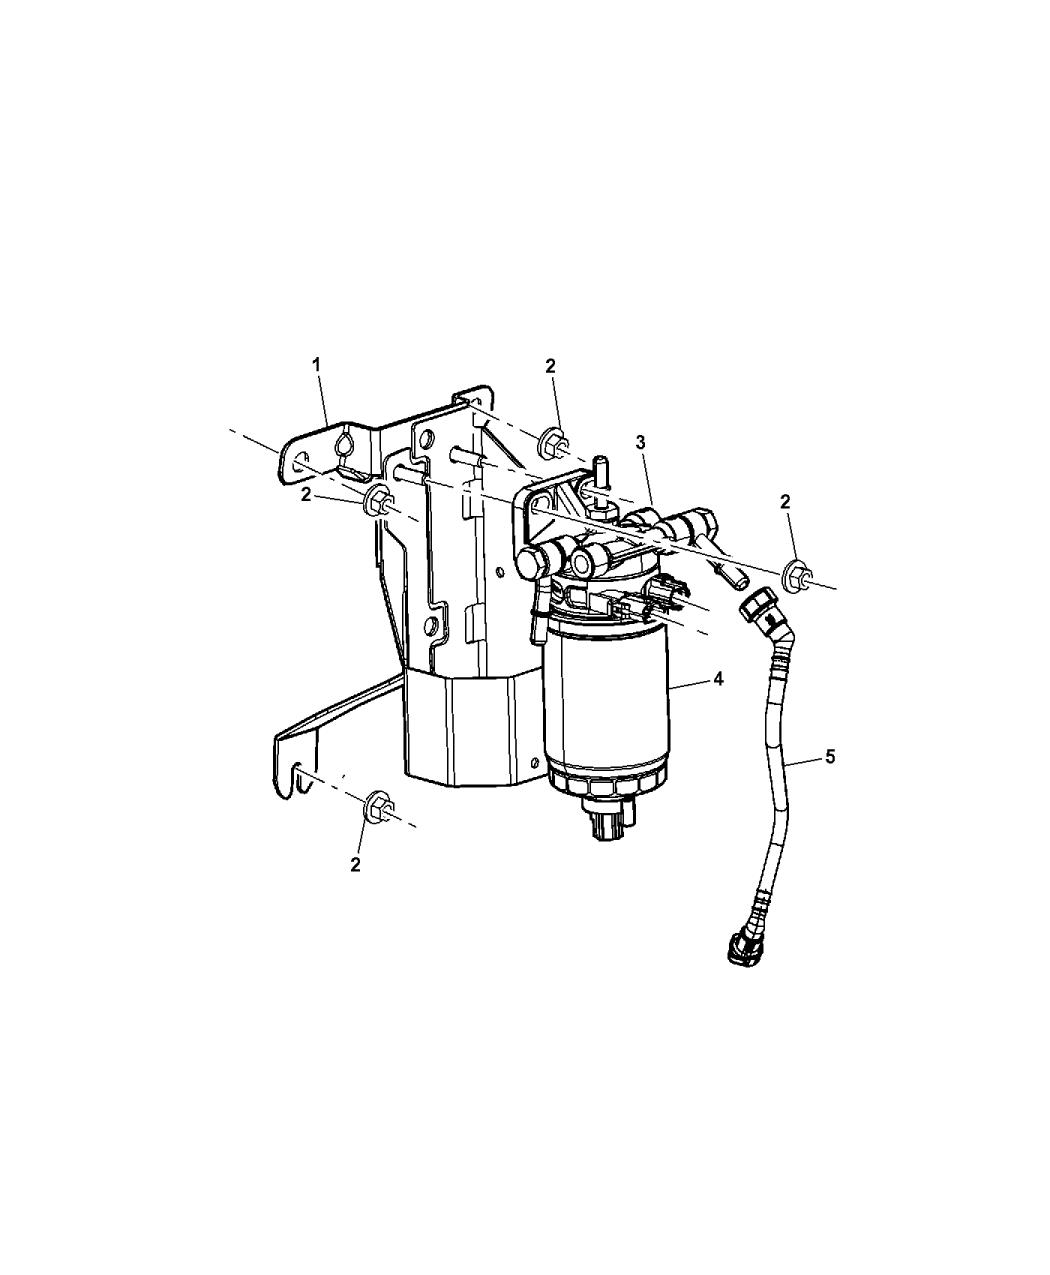 Dodge Nitro Fuel Filter Amp Water Separator